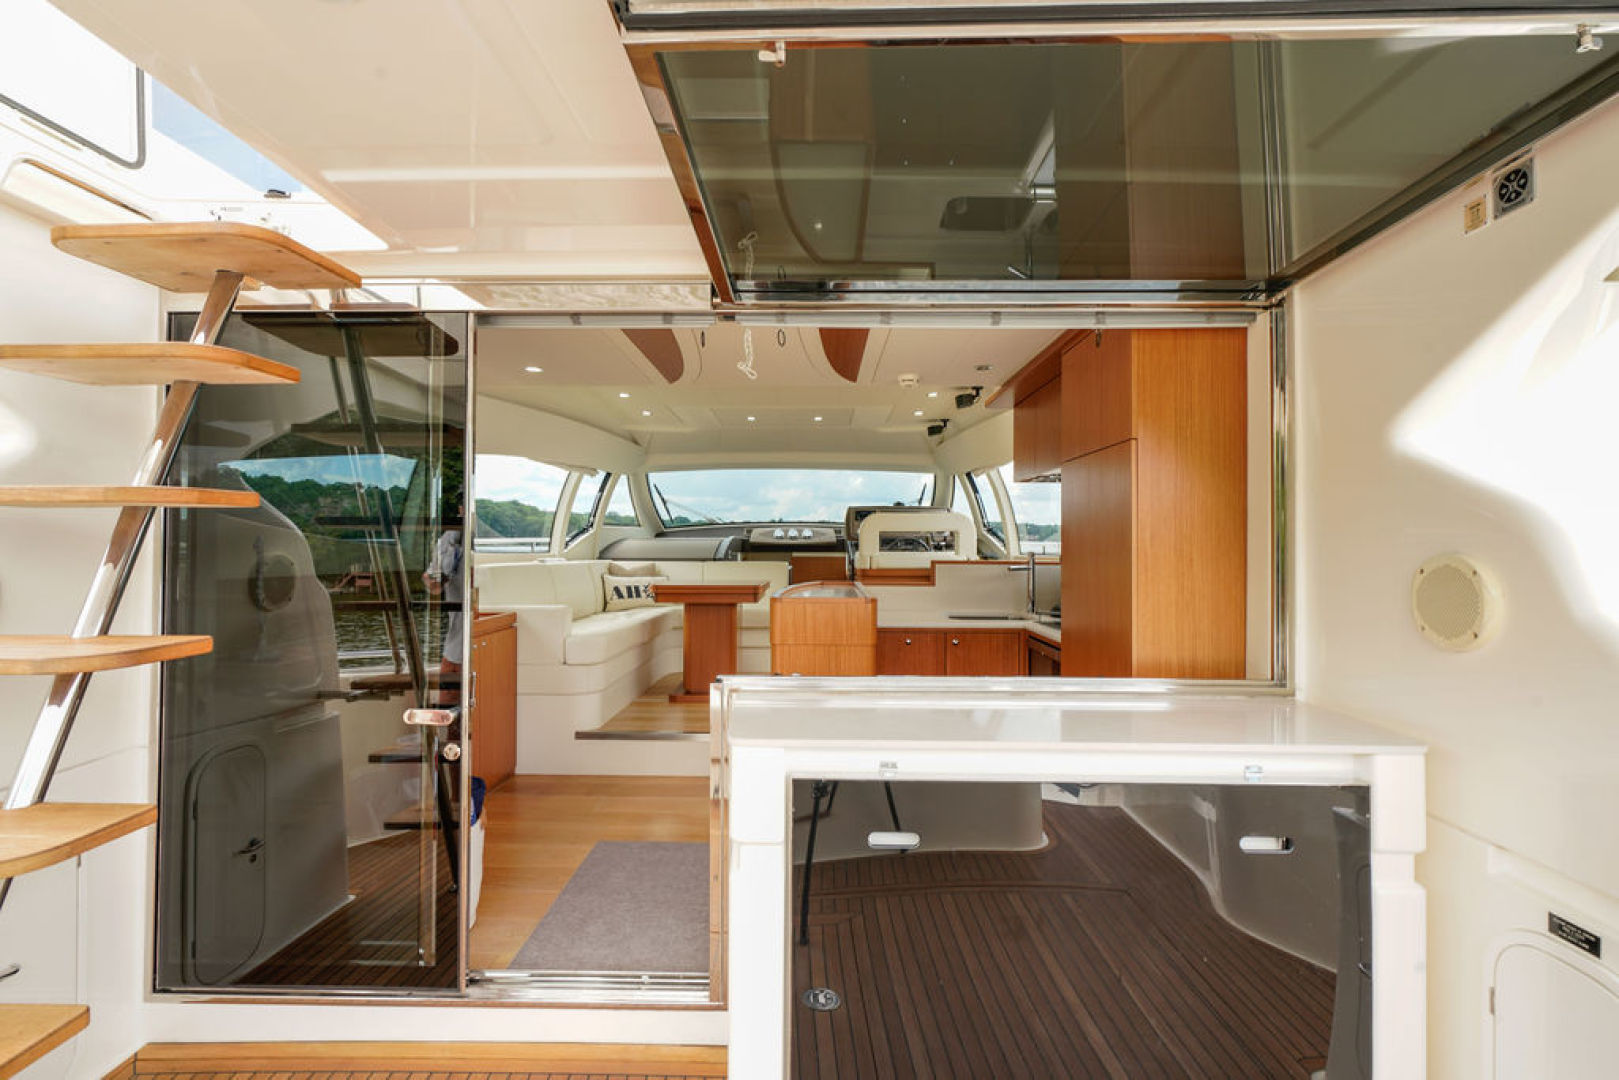 Ferretti Yachts-530 2013-ISLAND GIRL Mount Juliet-Tennessee-United States-1574689   Thumbnail